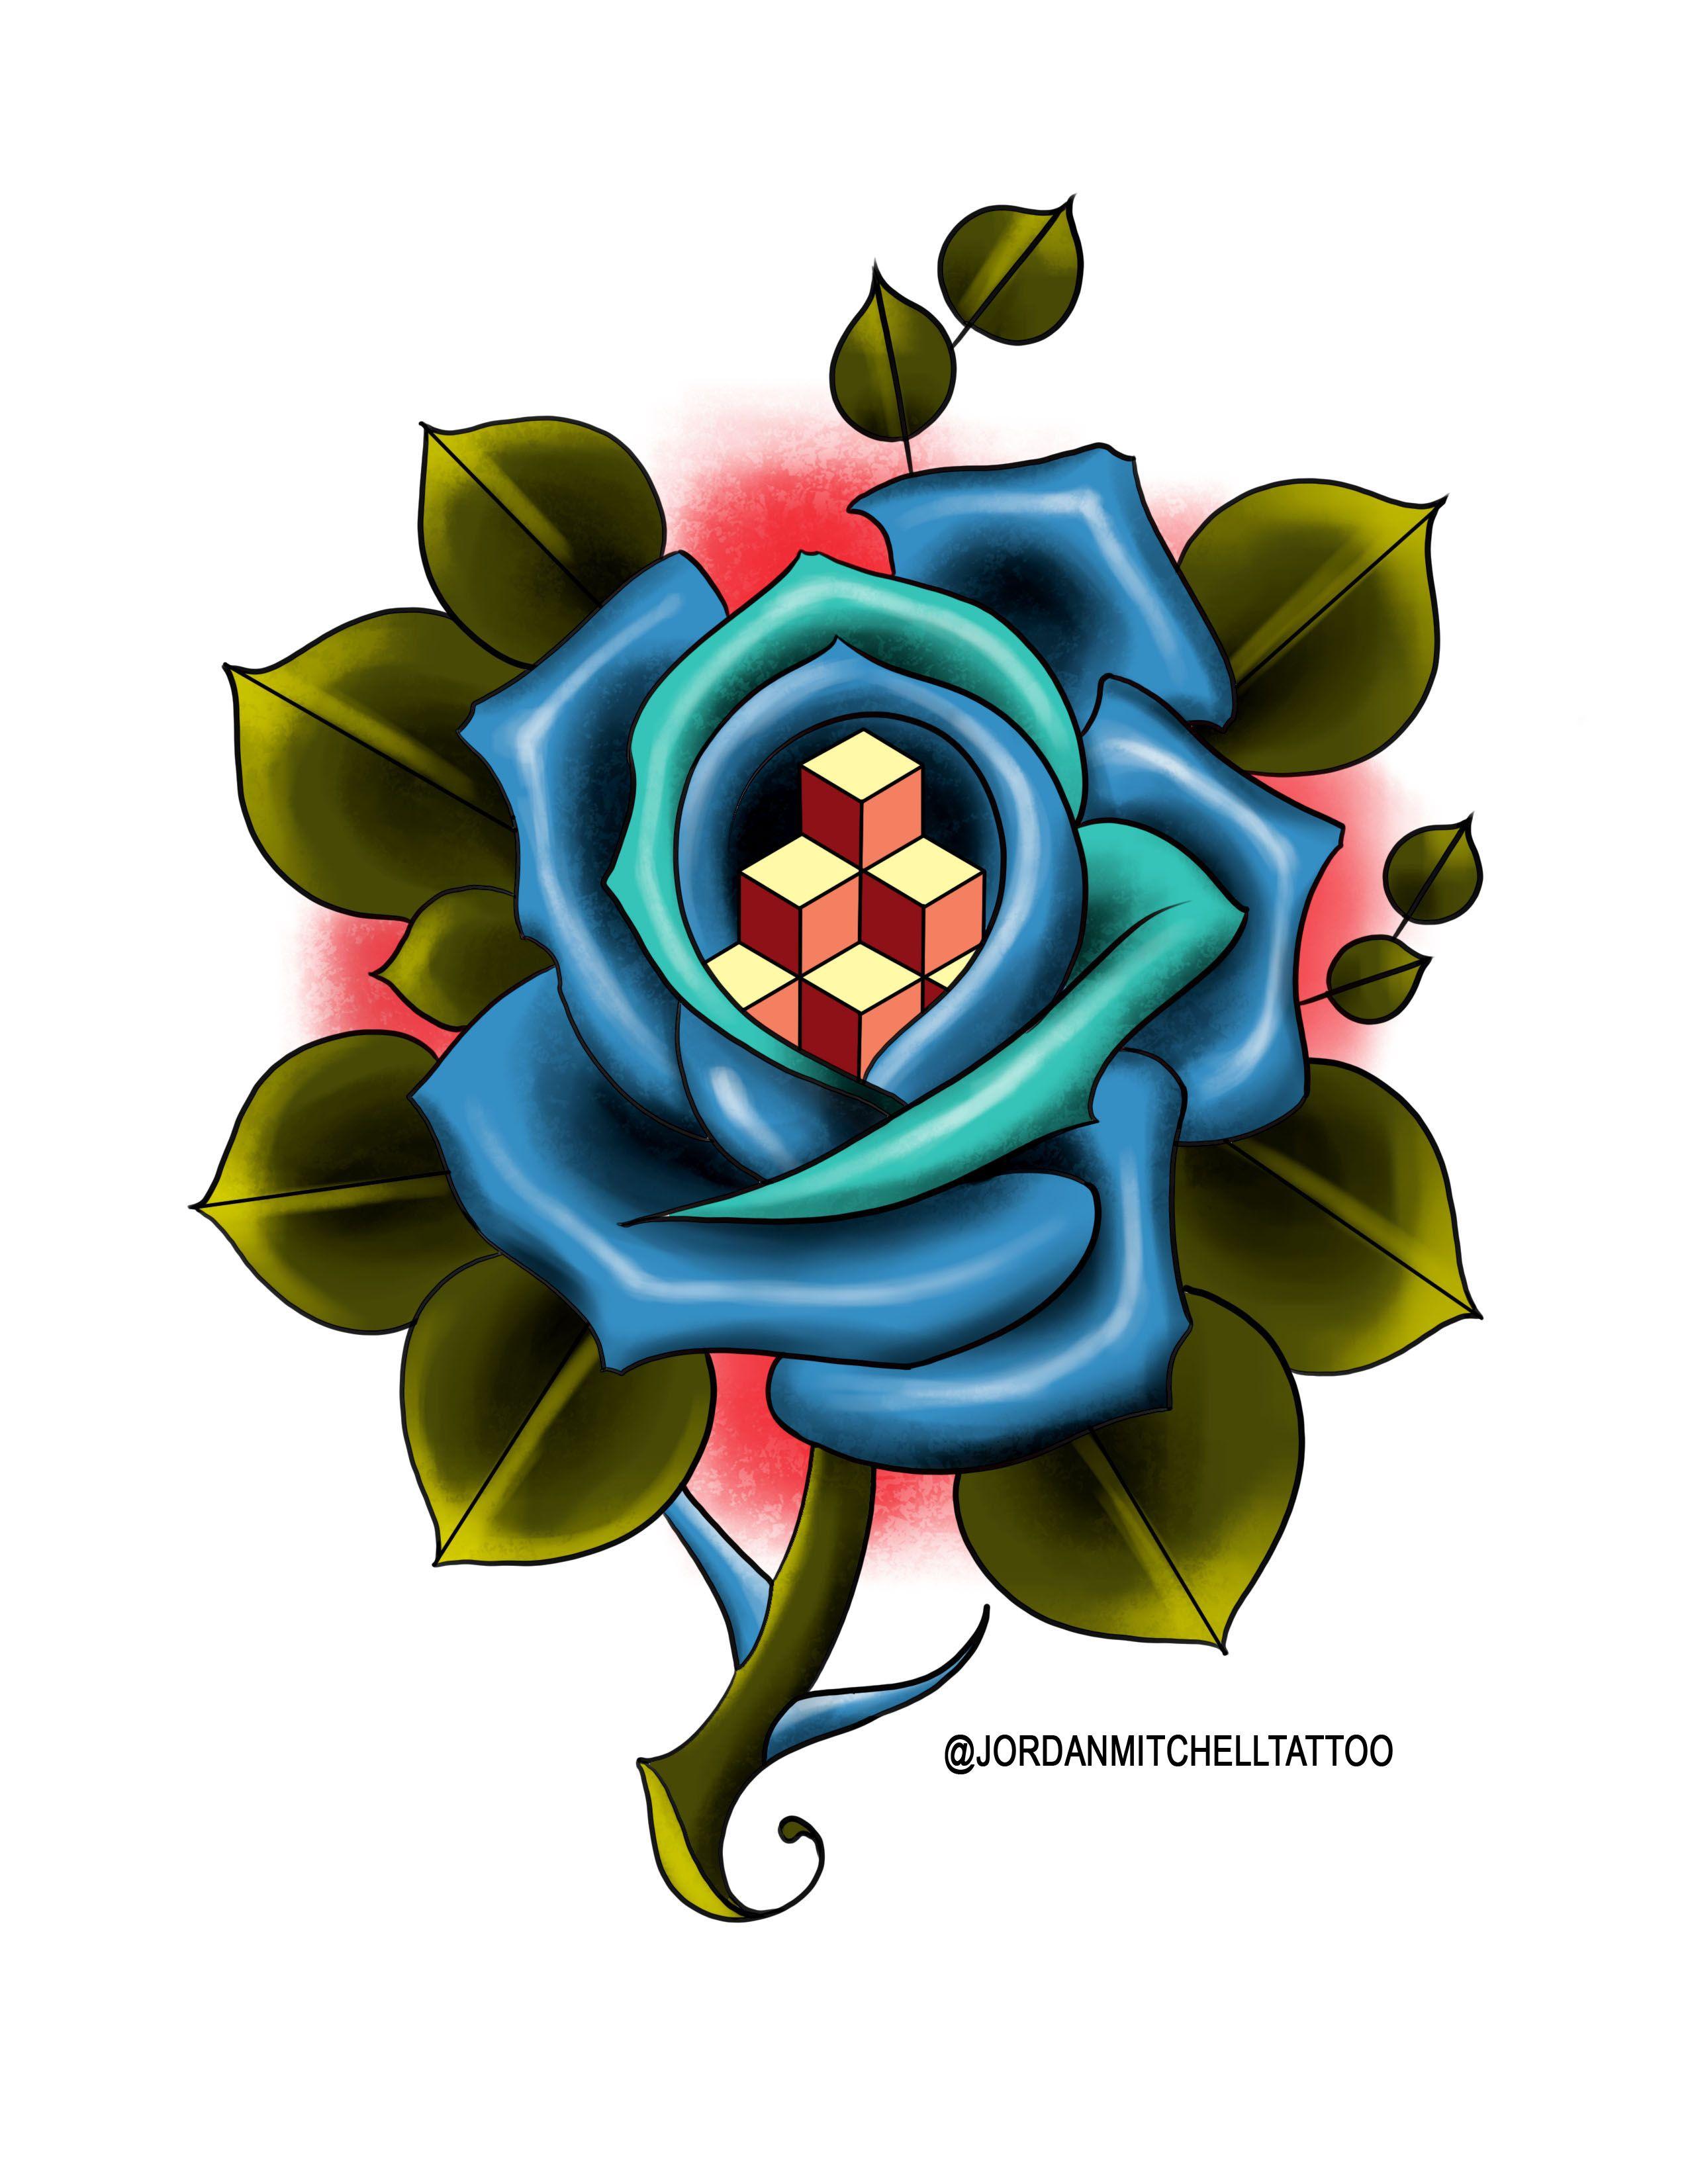 Jordanmitchelltattoo@gmail.com #tattoo #tattoos #jordanmitchelltattoo #austin #austintx #austintattooartist #austintexas #atx #austintattoo #512 #texastattoos #goldenagetattoos #do512 #ink #art #ntgallery #spratx